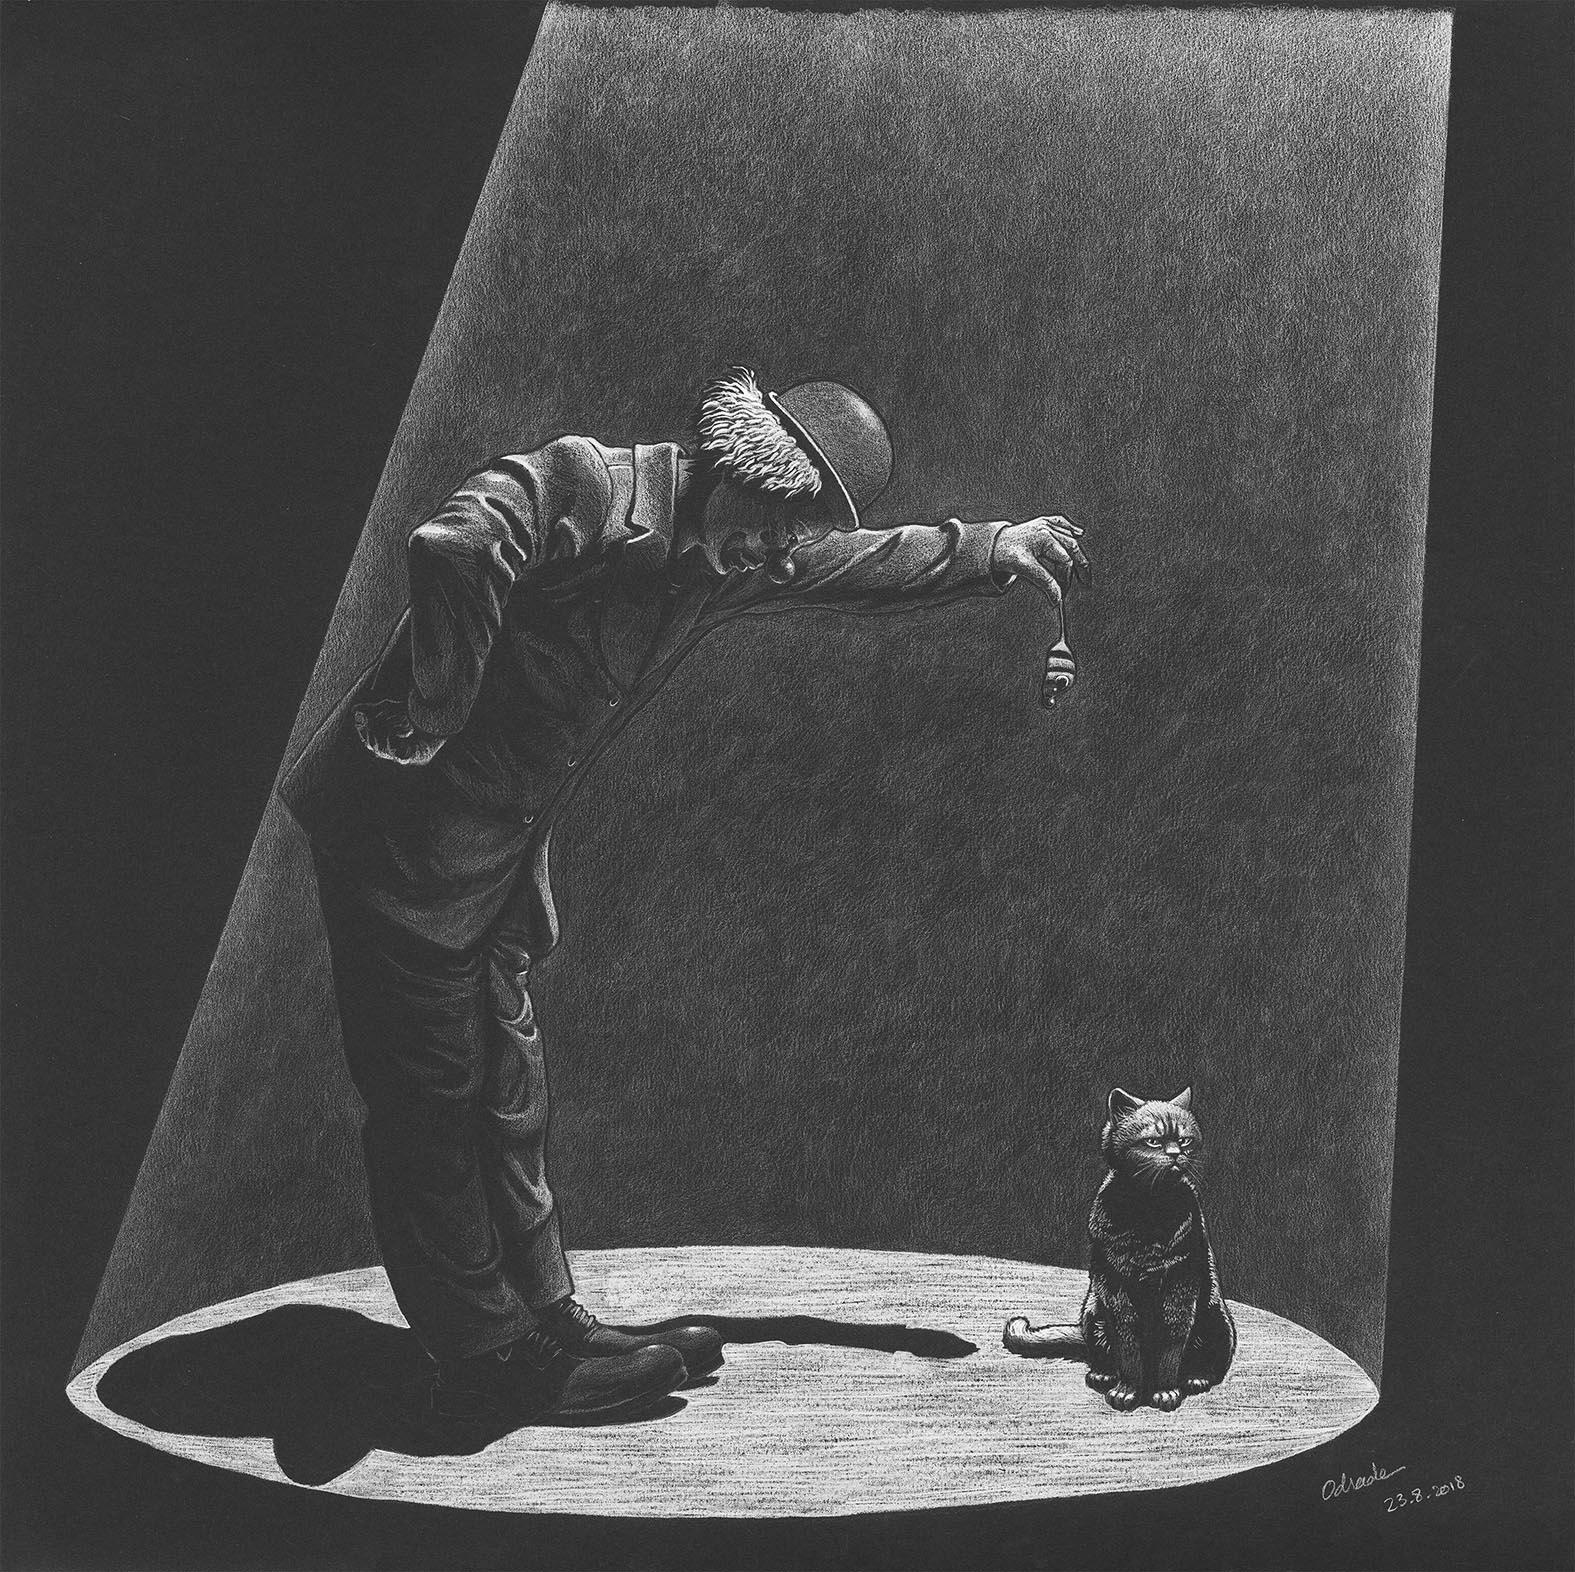 clownnbmodifpp-jpg.7587, Mijn kat-stripboek, Boeken, strips, naslagwerk en creativiteit, Kattenforum SjEd, 12571, clownnbmodifpp-jpg.7587, 16:19, 1 dec 2017, 23 okt 2018, 1919, 17:21